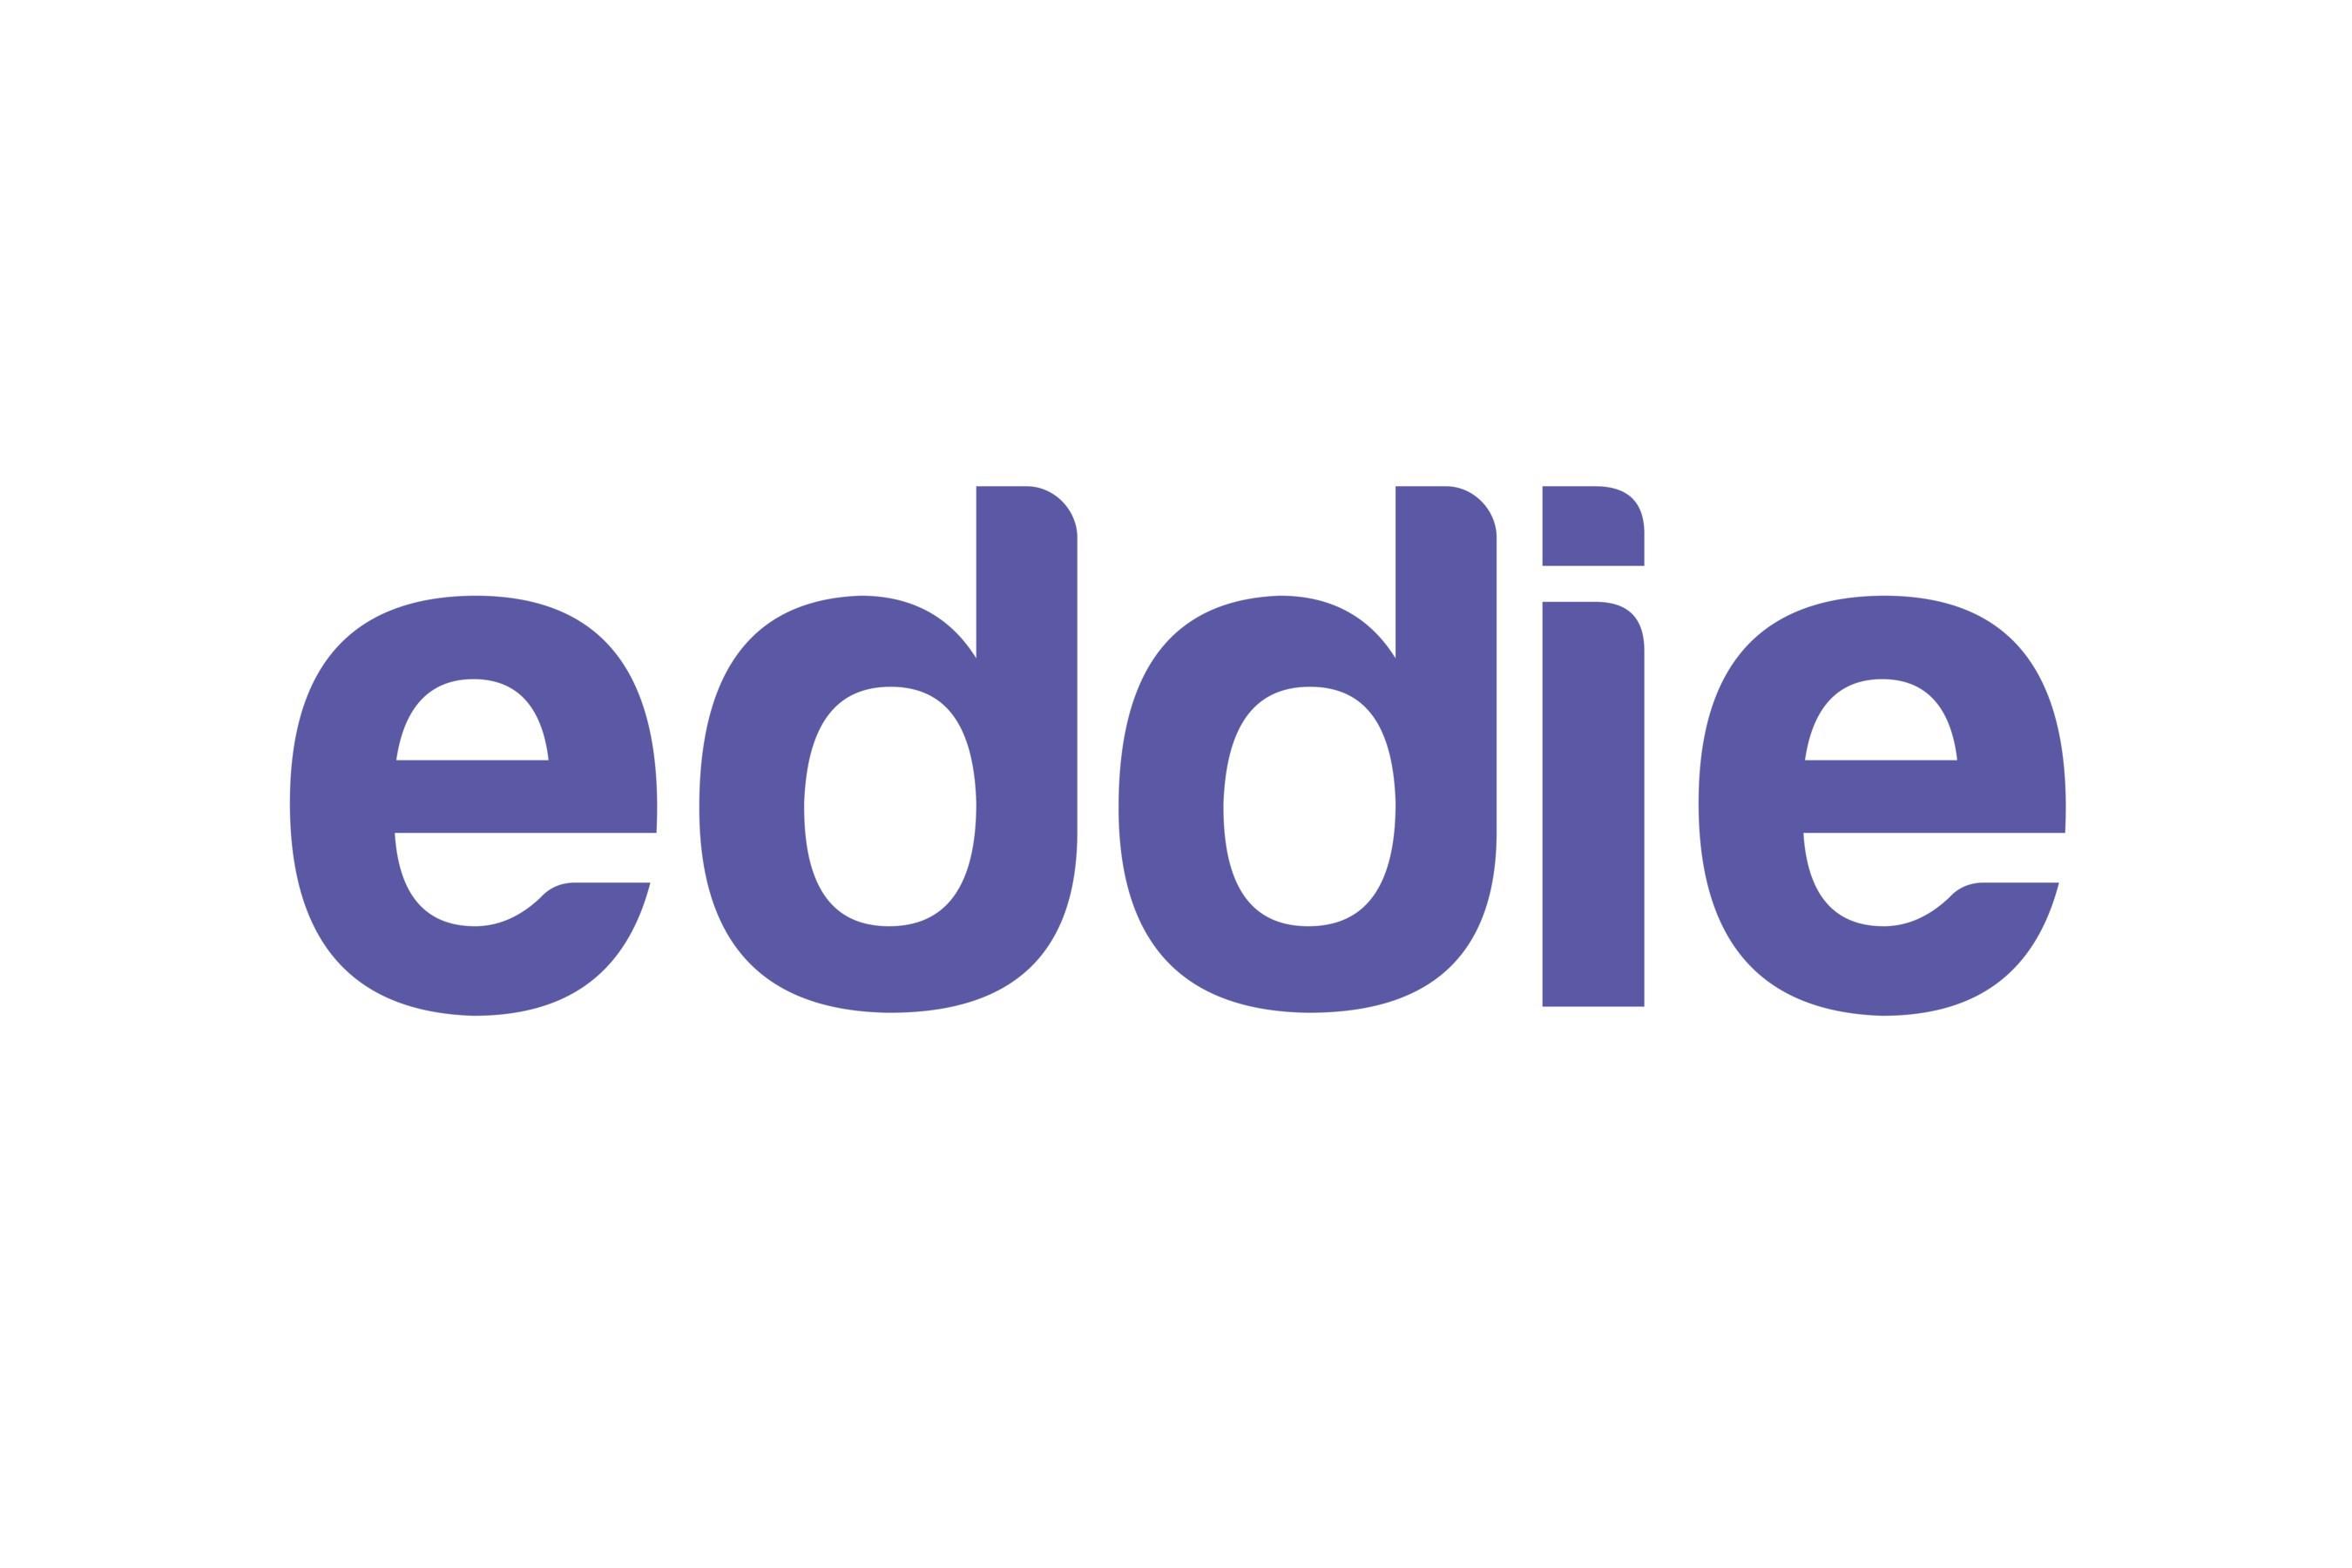 eddie-logo.jpg